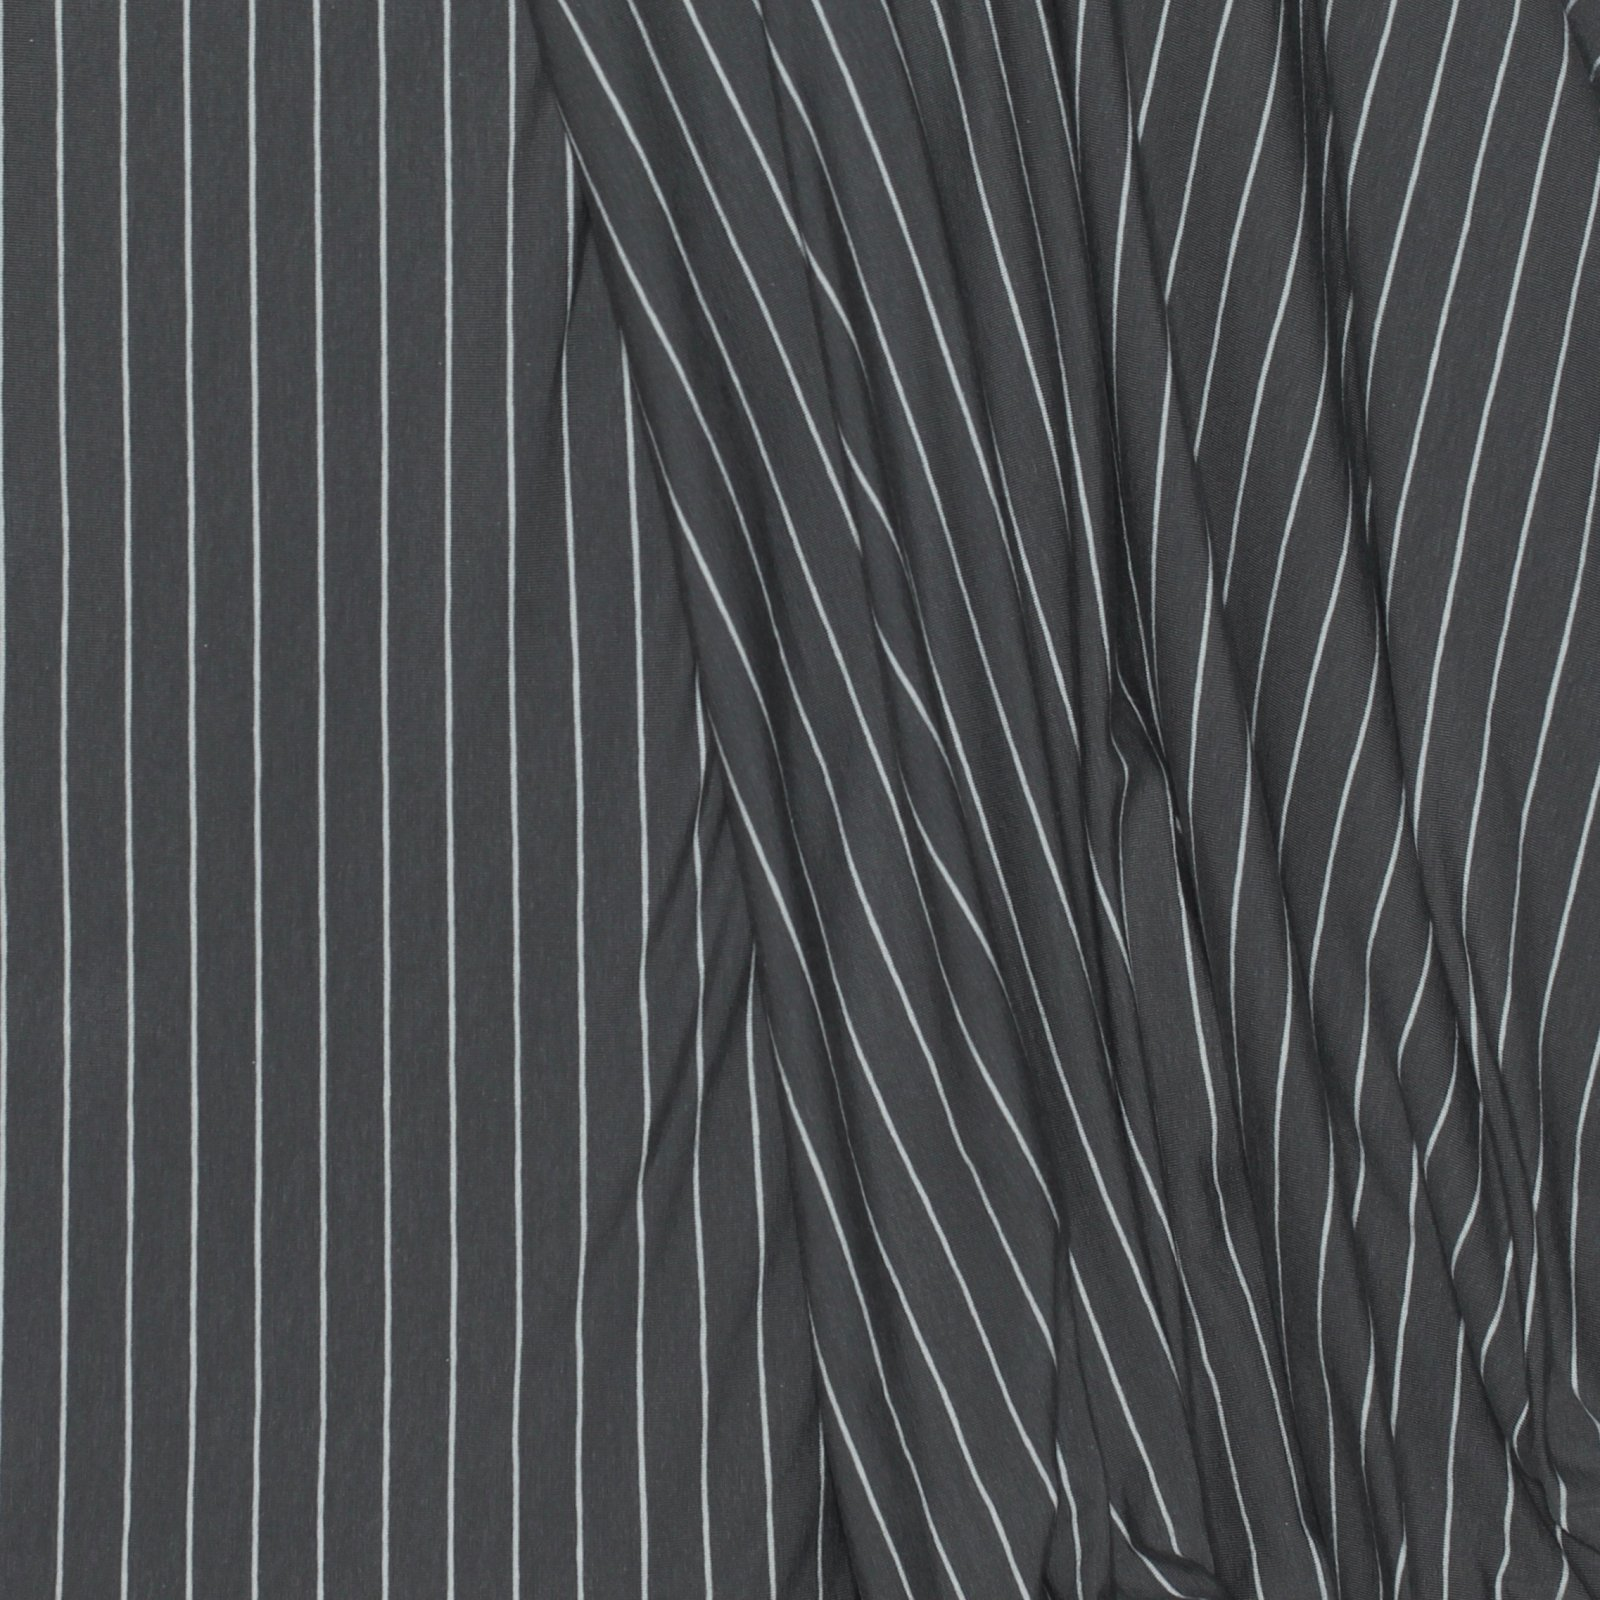 Striped Sleek Graphite - Art Gallery Cotton Knit